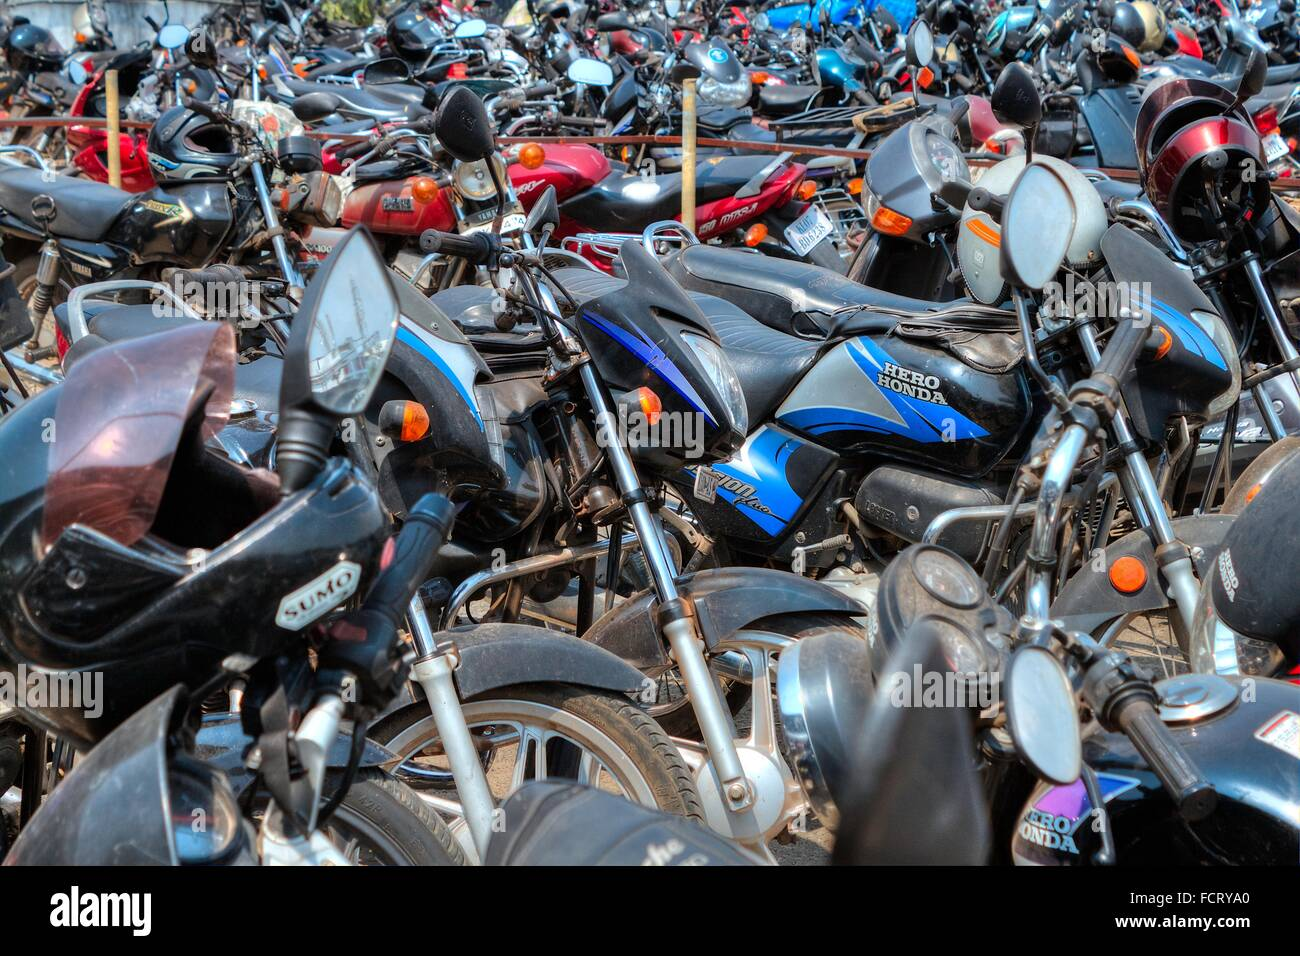 Scooter Parking Park Motorbike Stock Photos Scooter Parking Park